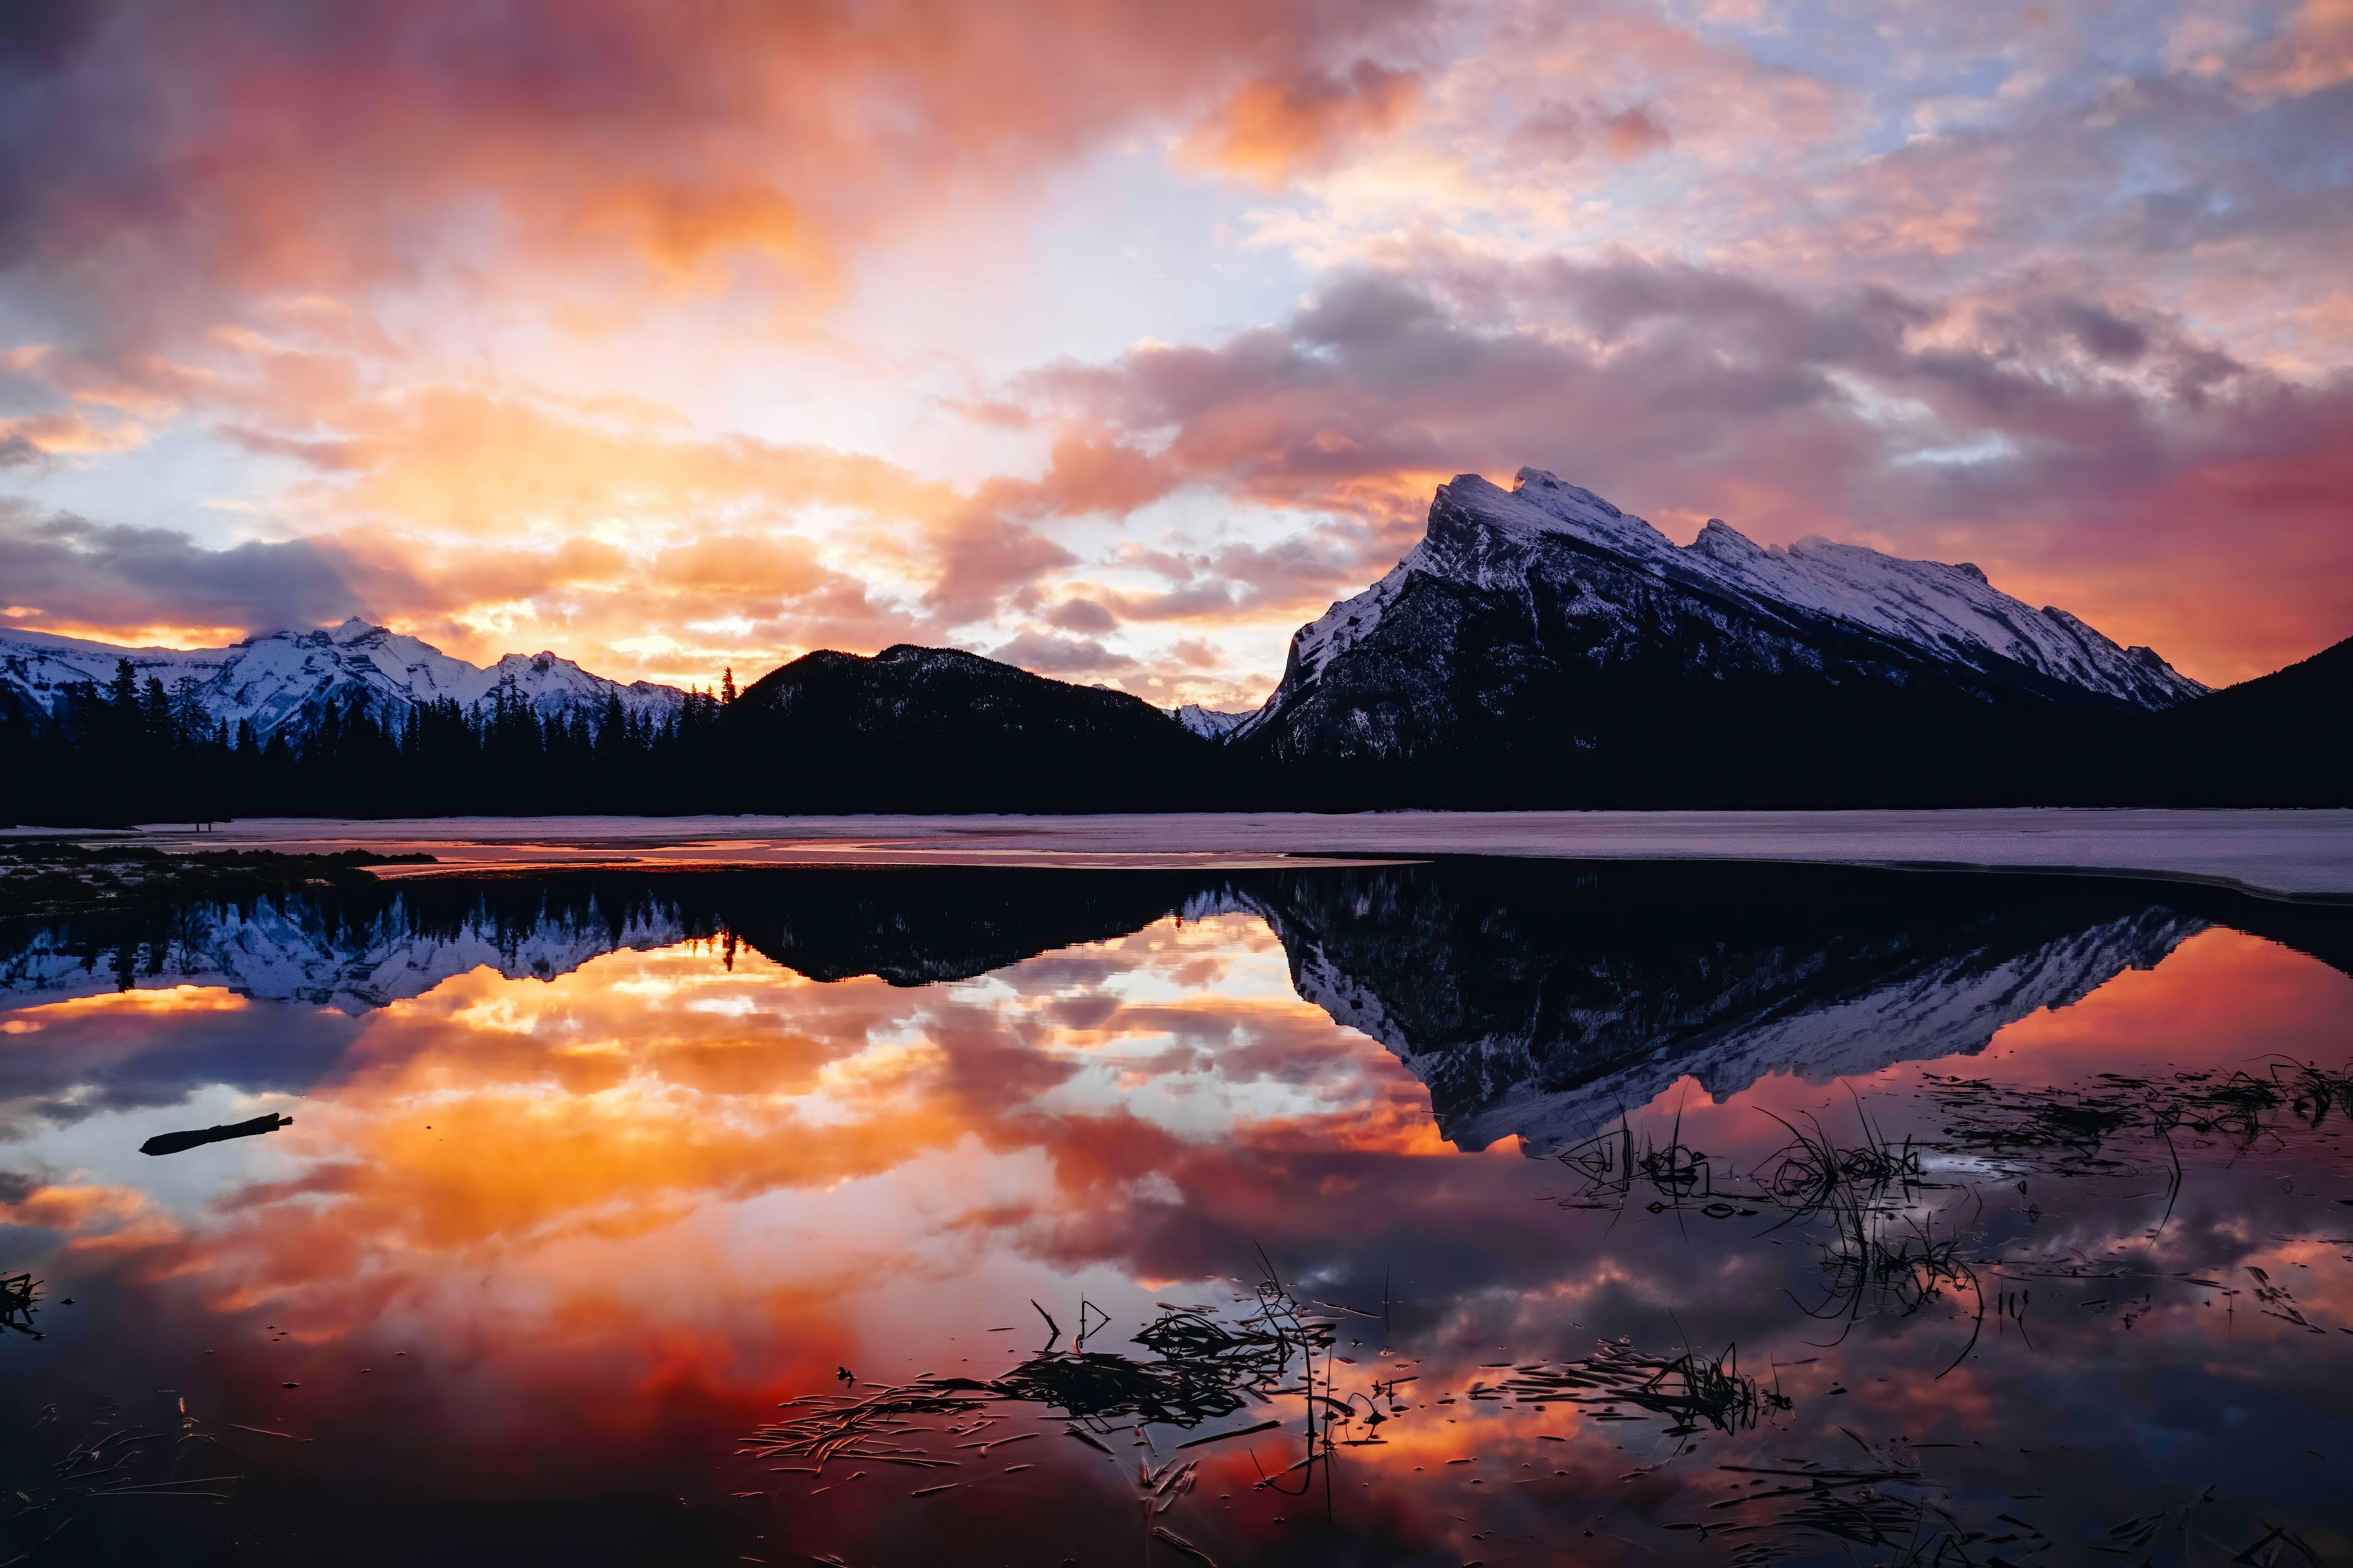 Vermilion Lakes Sunset in Banff National Park